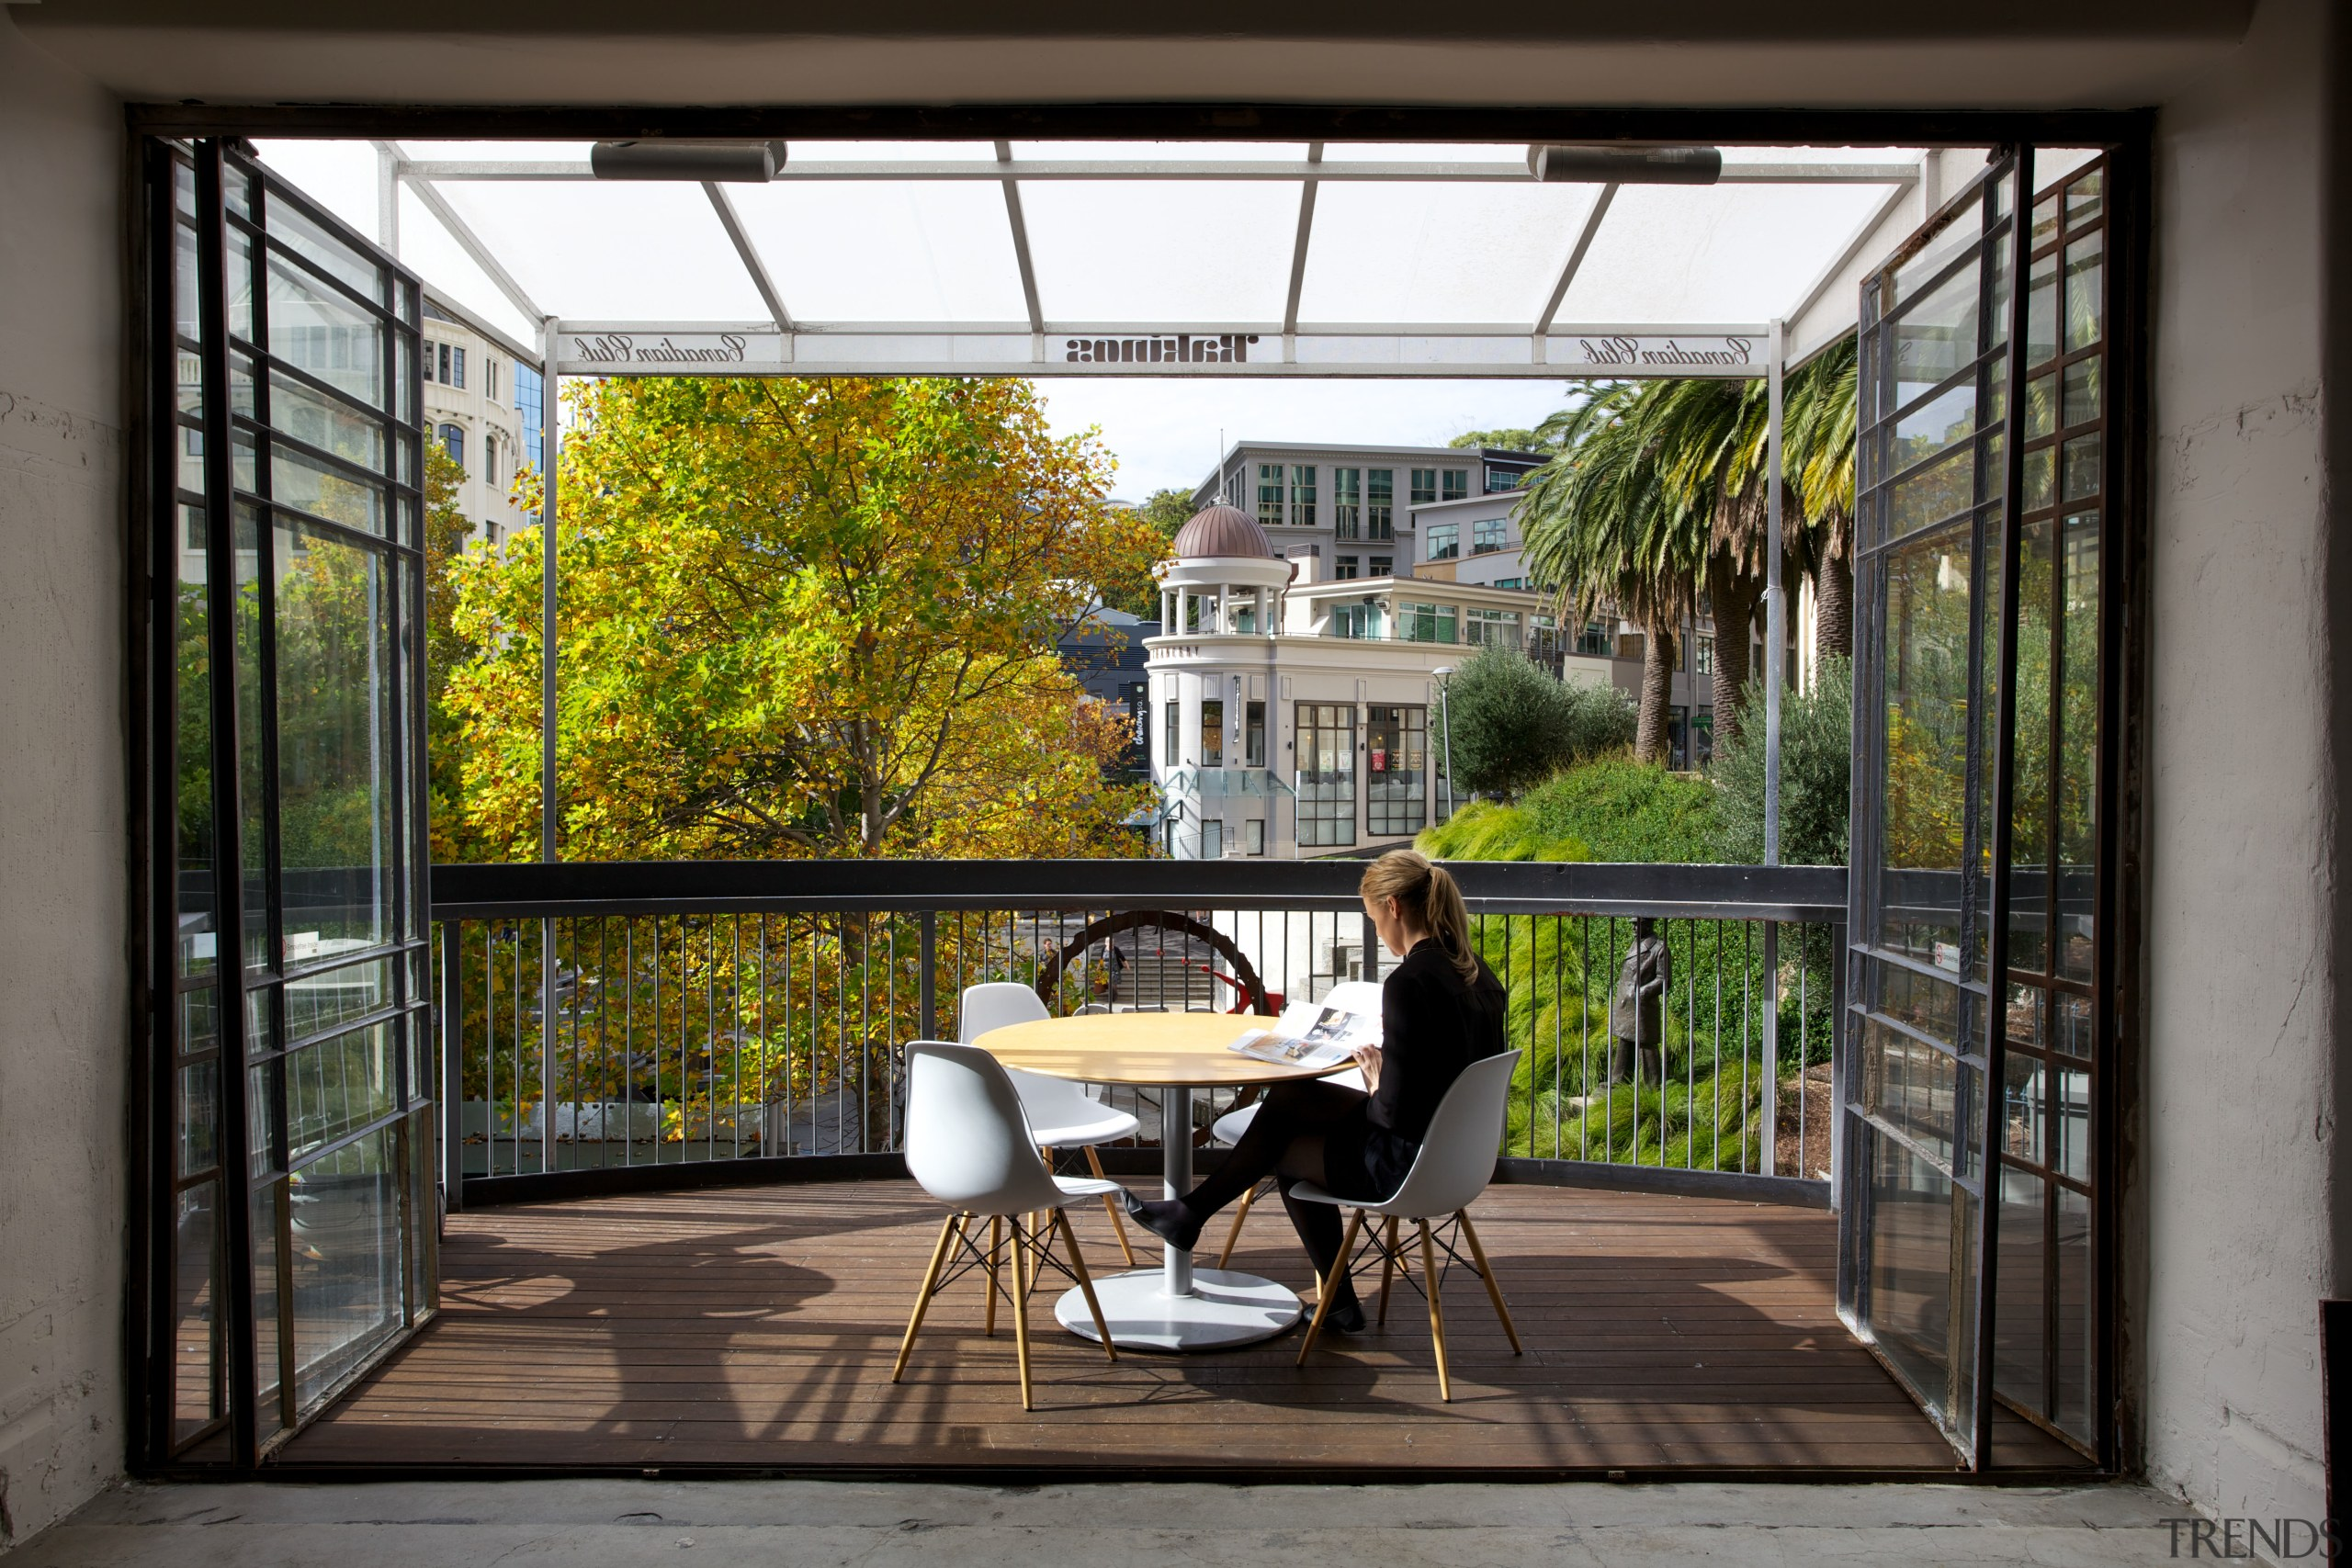 Steel doors open up to the Gaze office architecture, balcony, courtyard, door, house, outdoor structure, real estate, window, black, gray